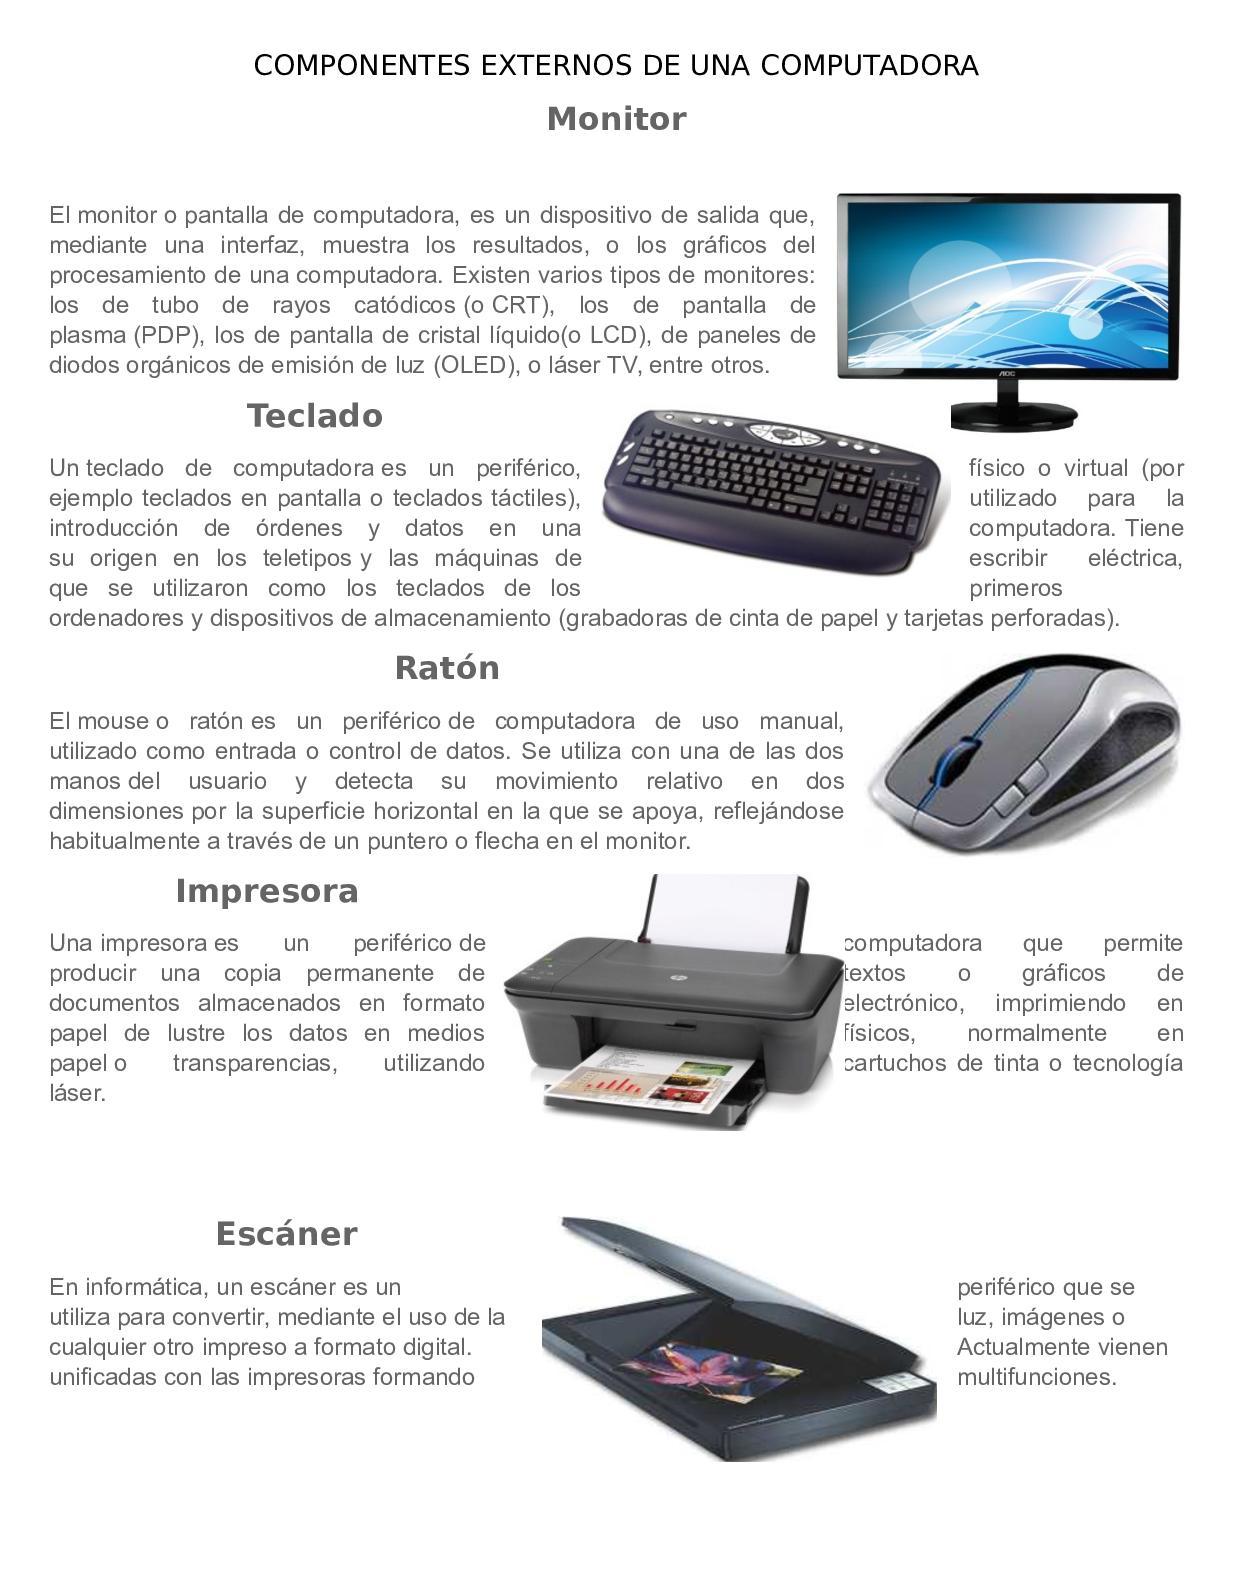 Calaméo - Componentes De Una Computadora